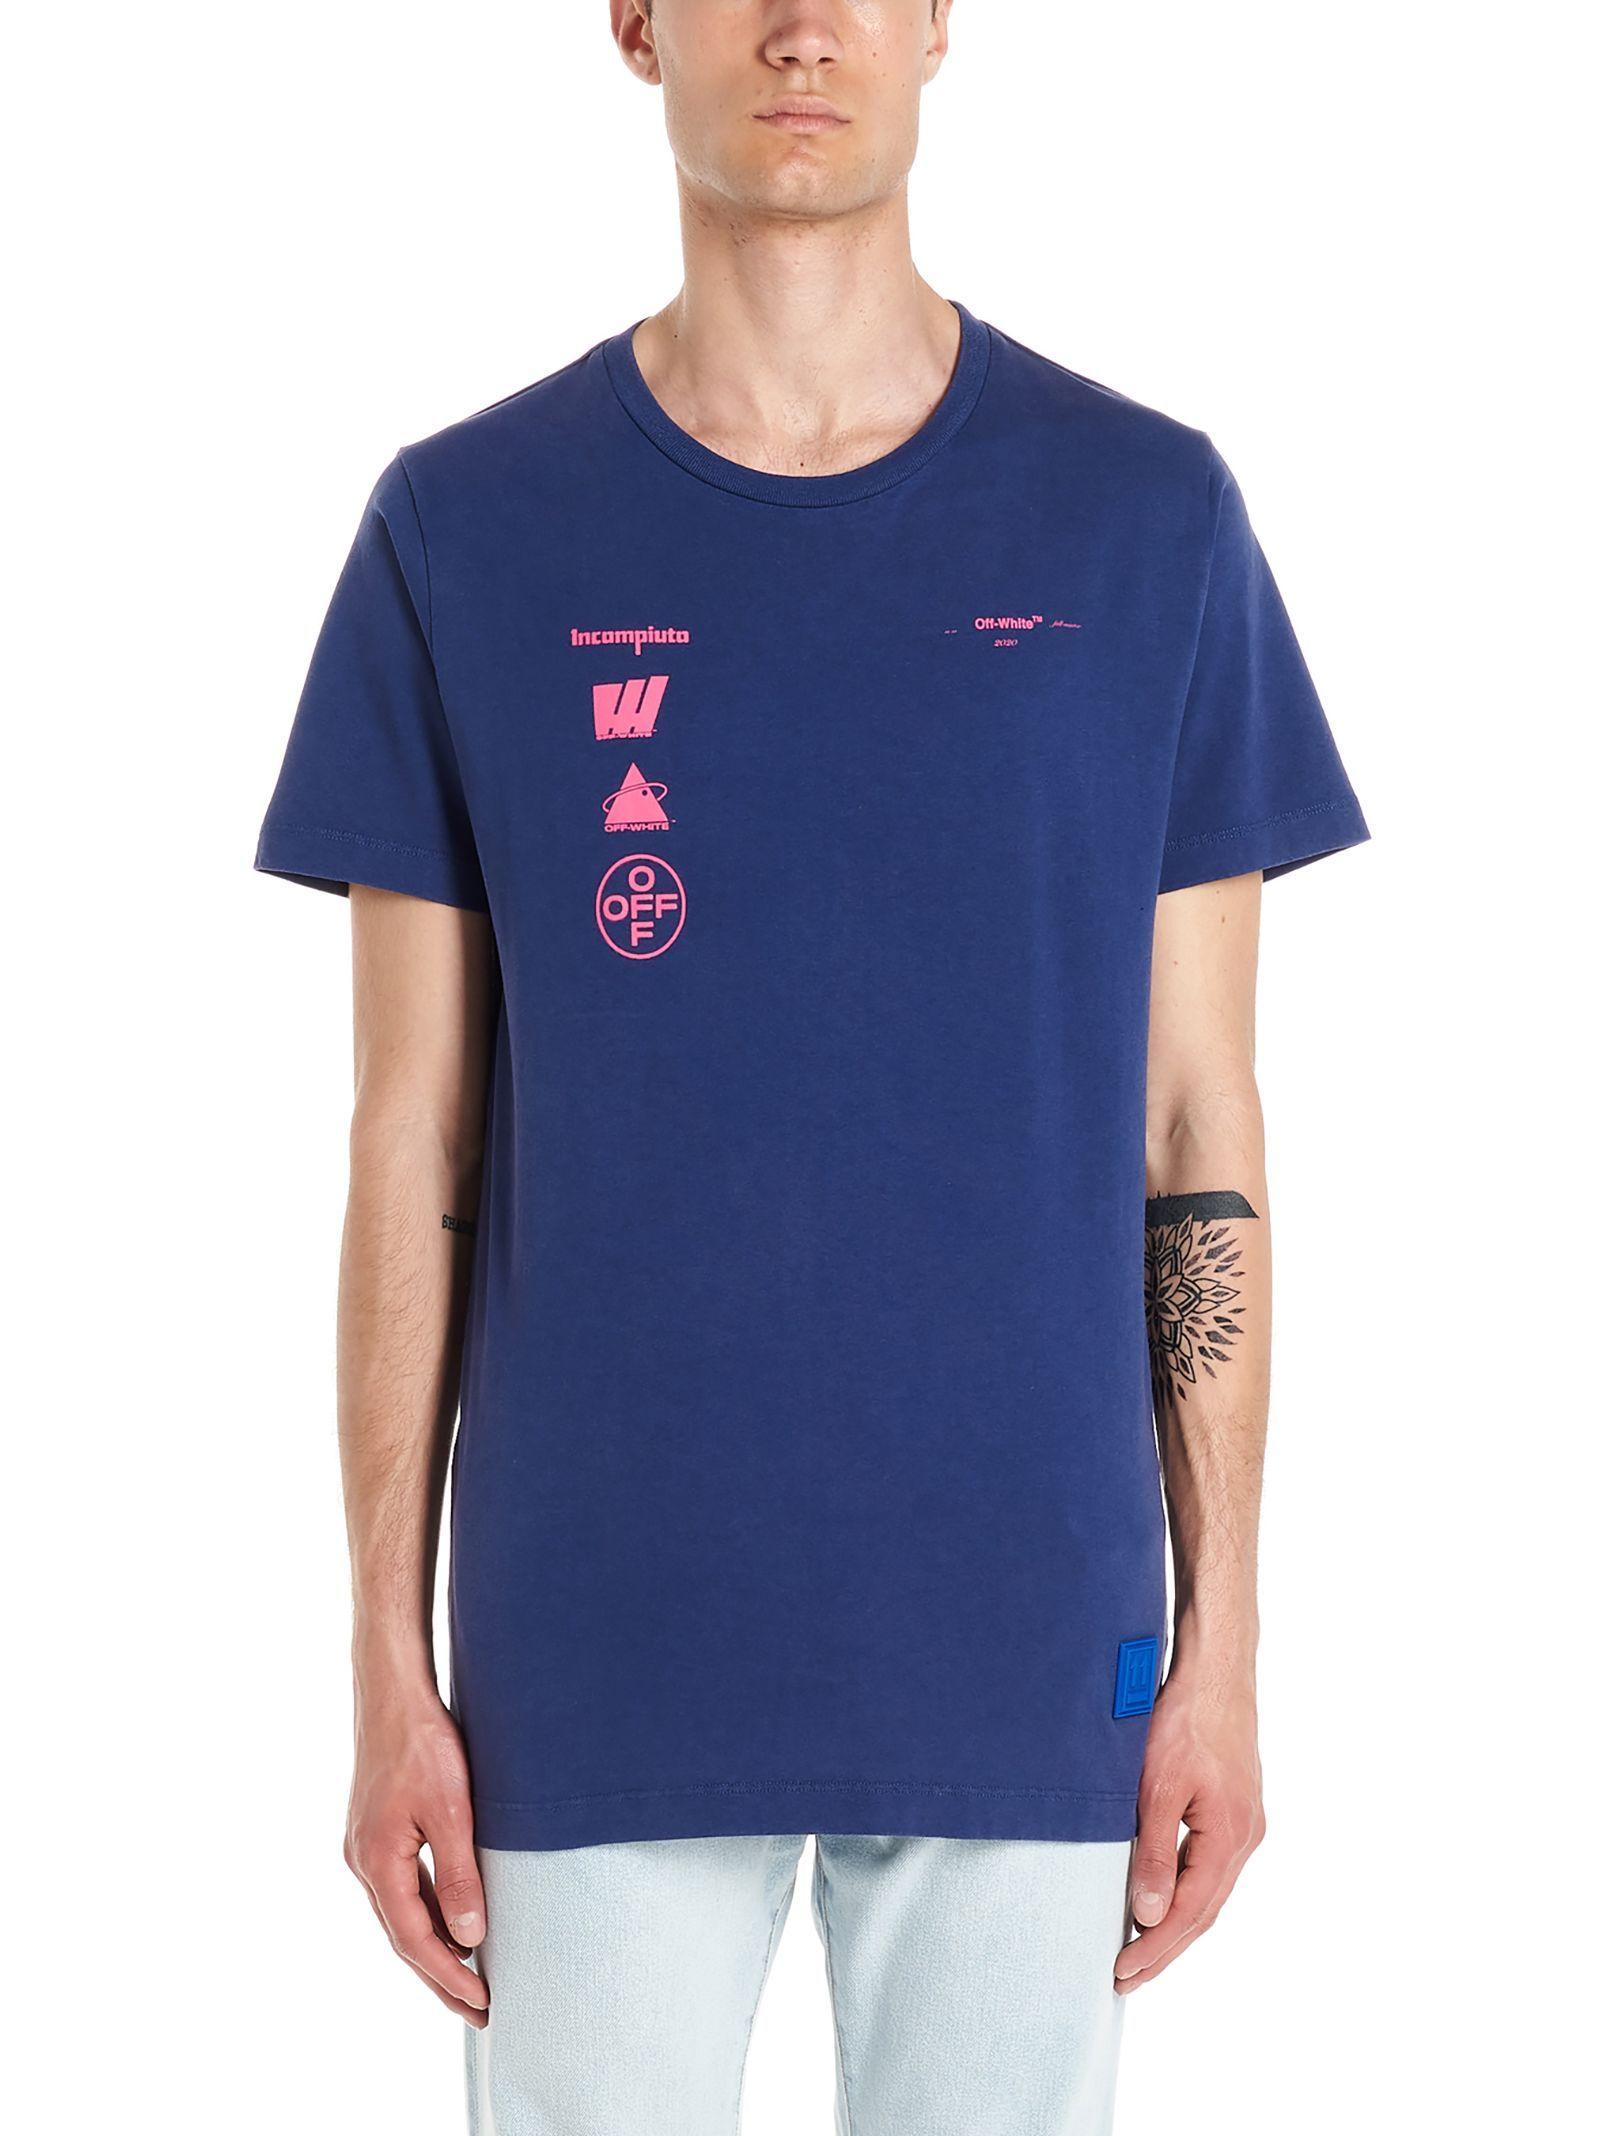 Off White Mariana De Silva T Shirt In Blu Multi Modesens [ 2136 x 1600 Pixel ]